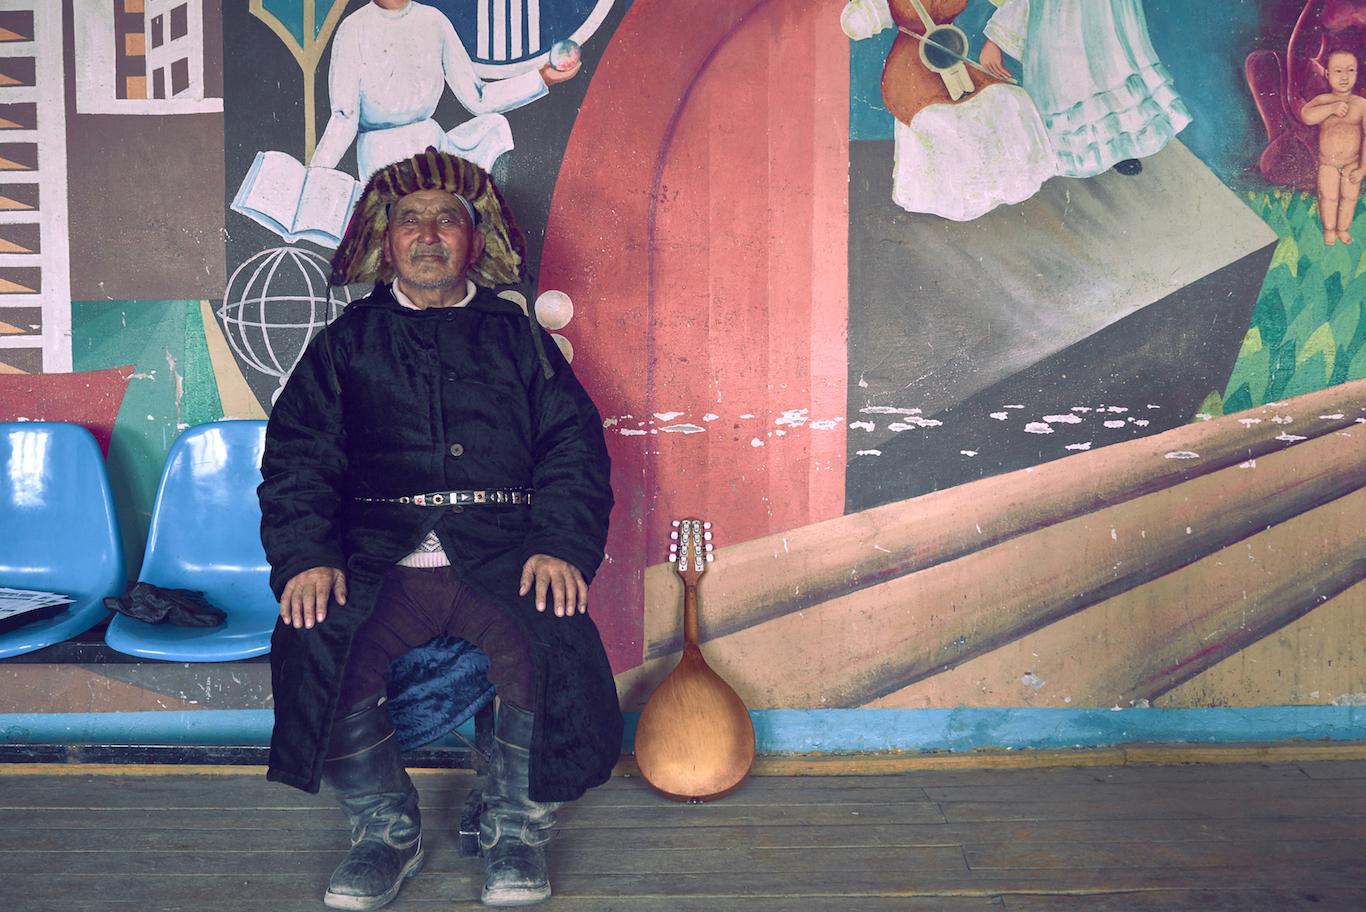 Khasar_S_BolarAtAudition_NogoonNuur_Mongolia_Spring_2015 2.jpg